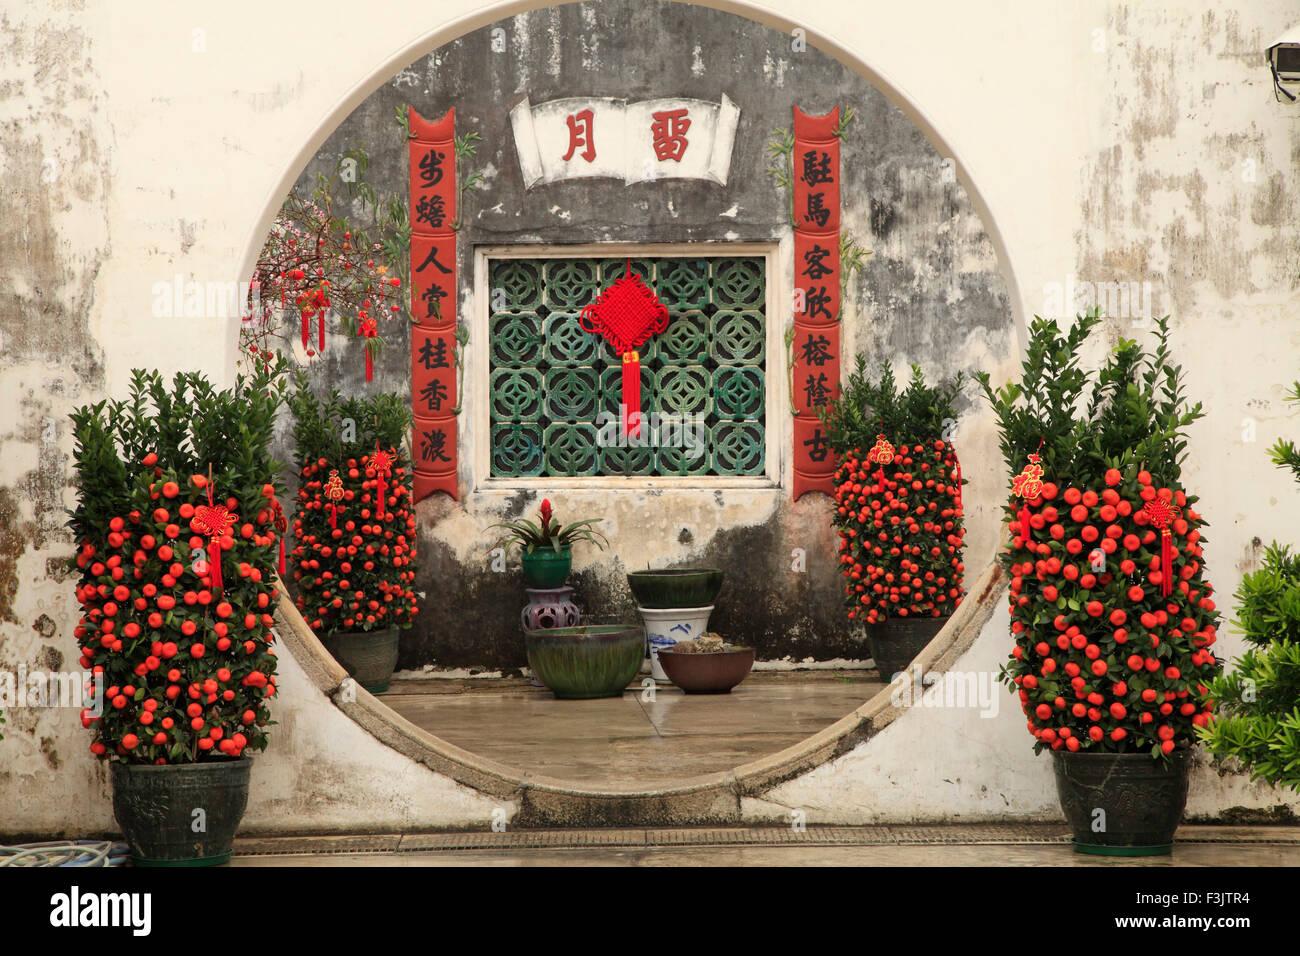 China, Macao, Mandarin House, Imagen De Stock